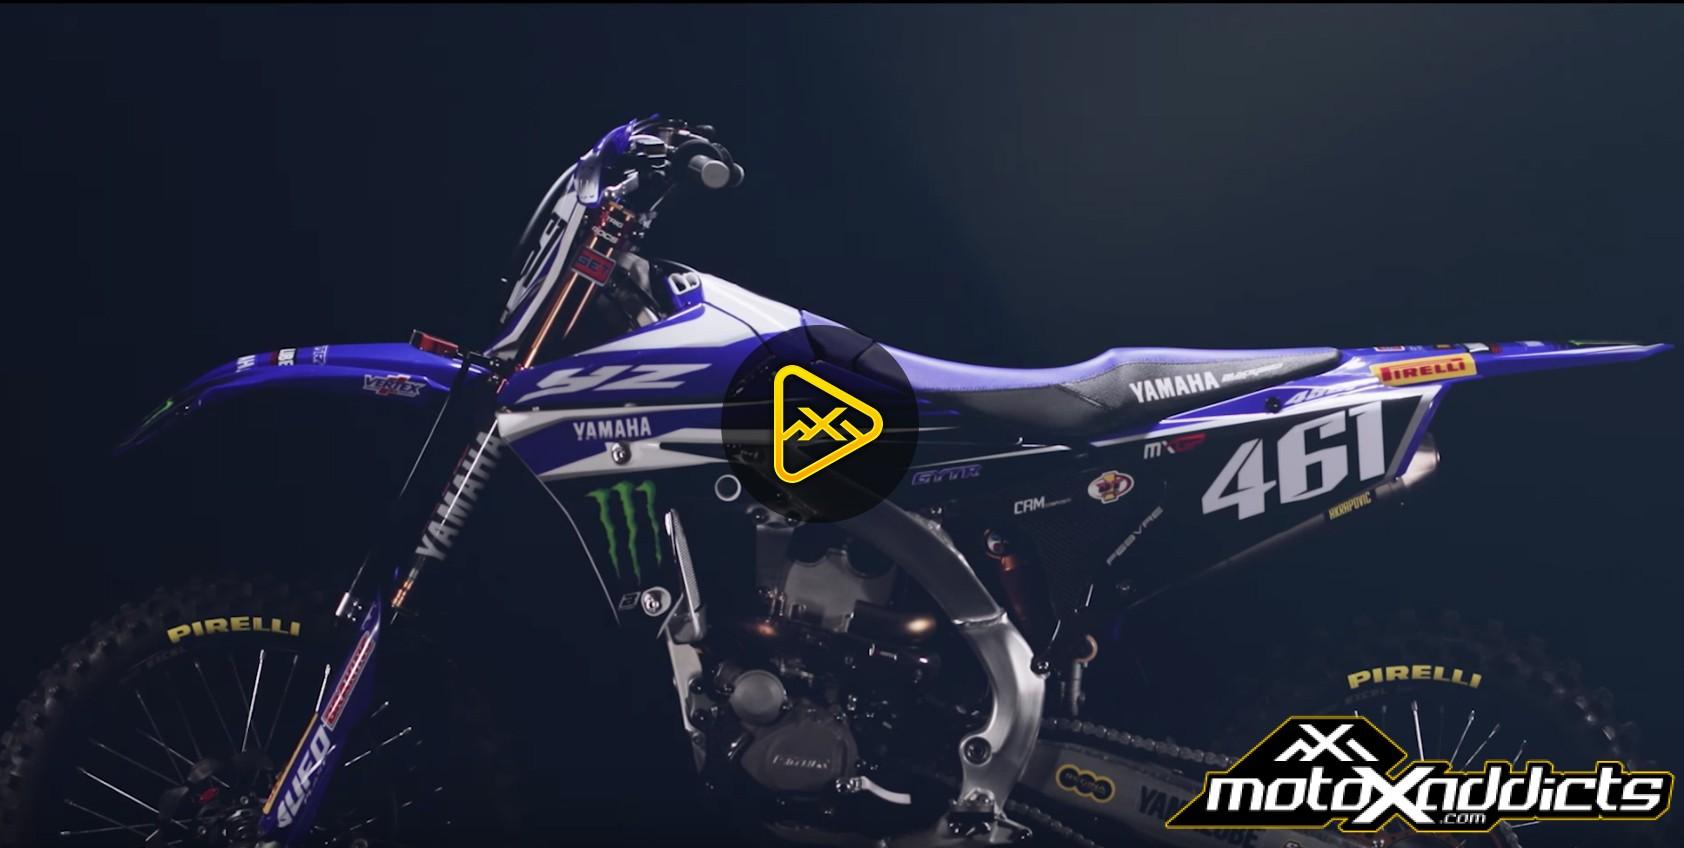 Monster Yamaha Factory MXGP Team's 2017 YZ450FM